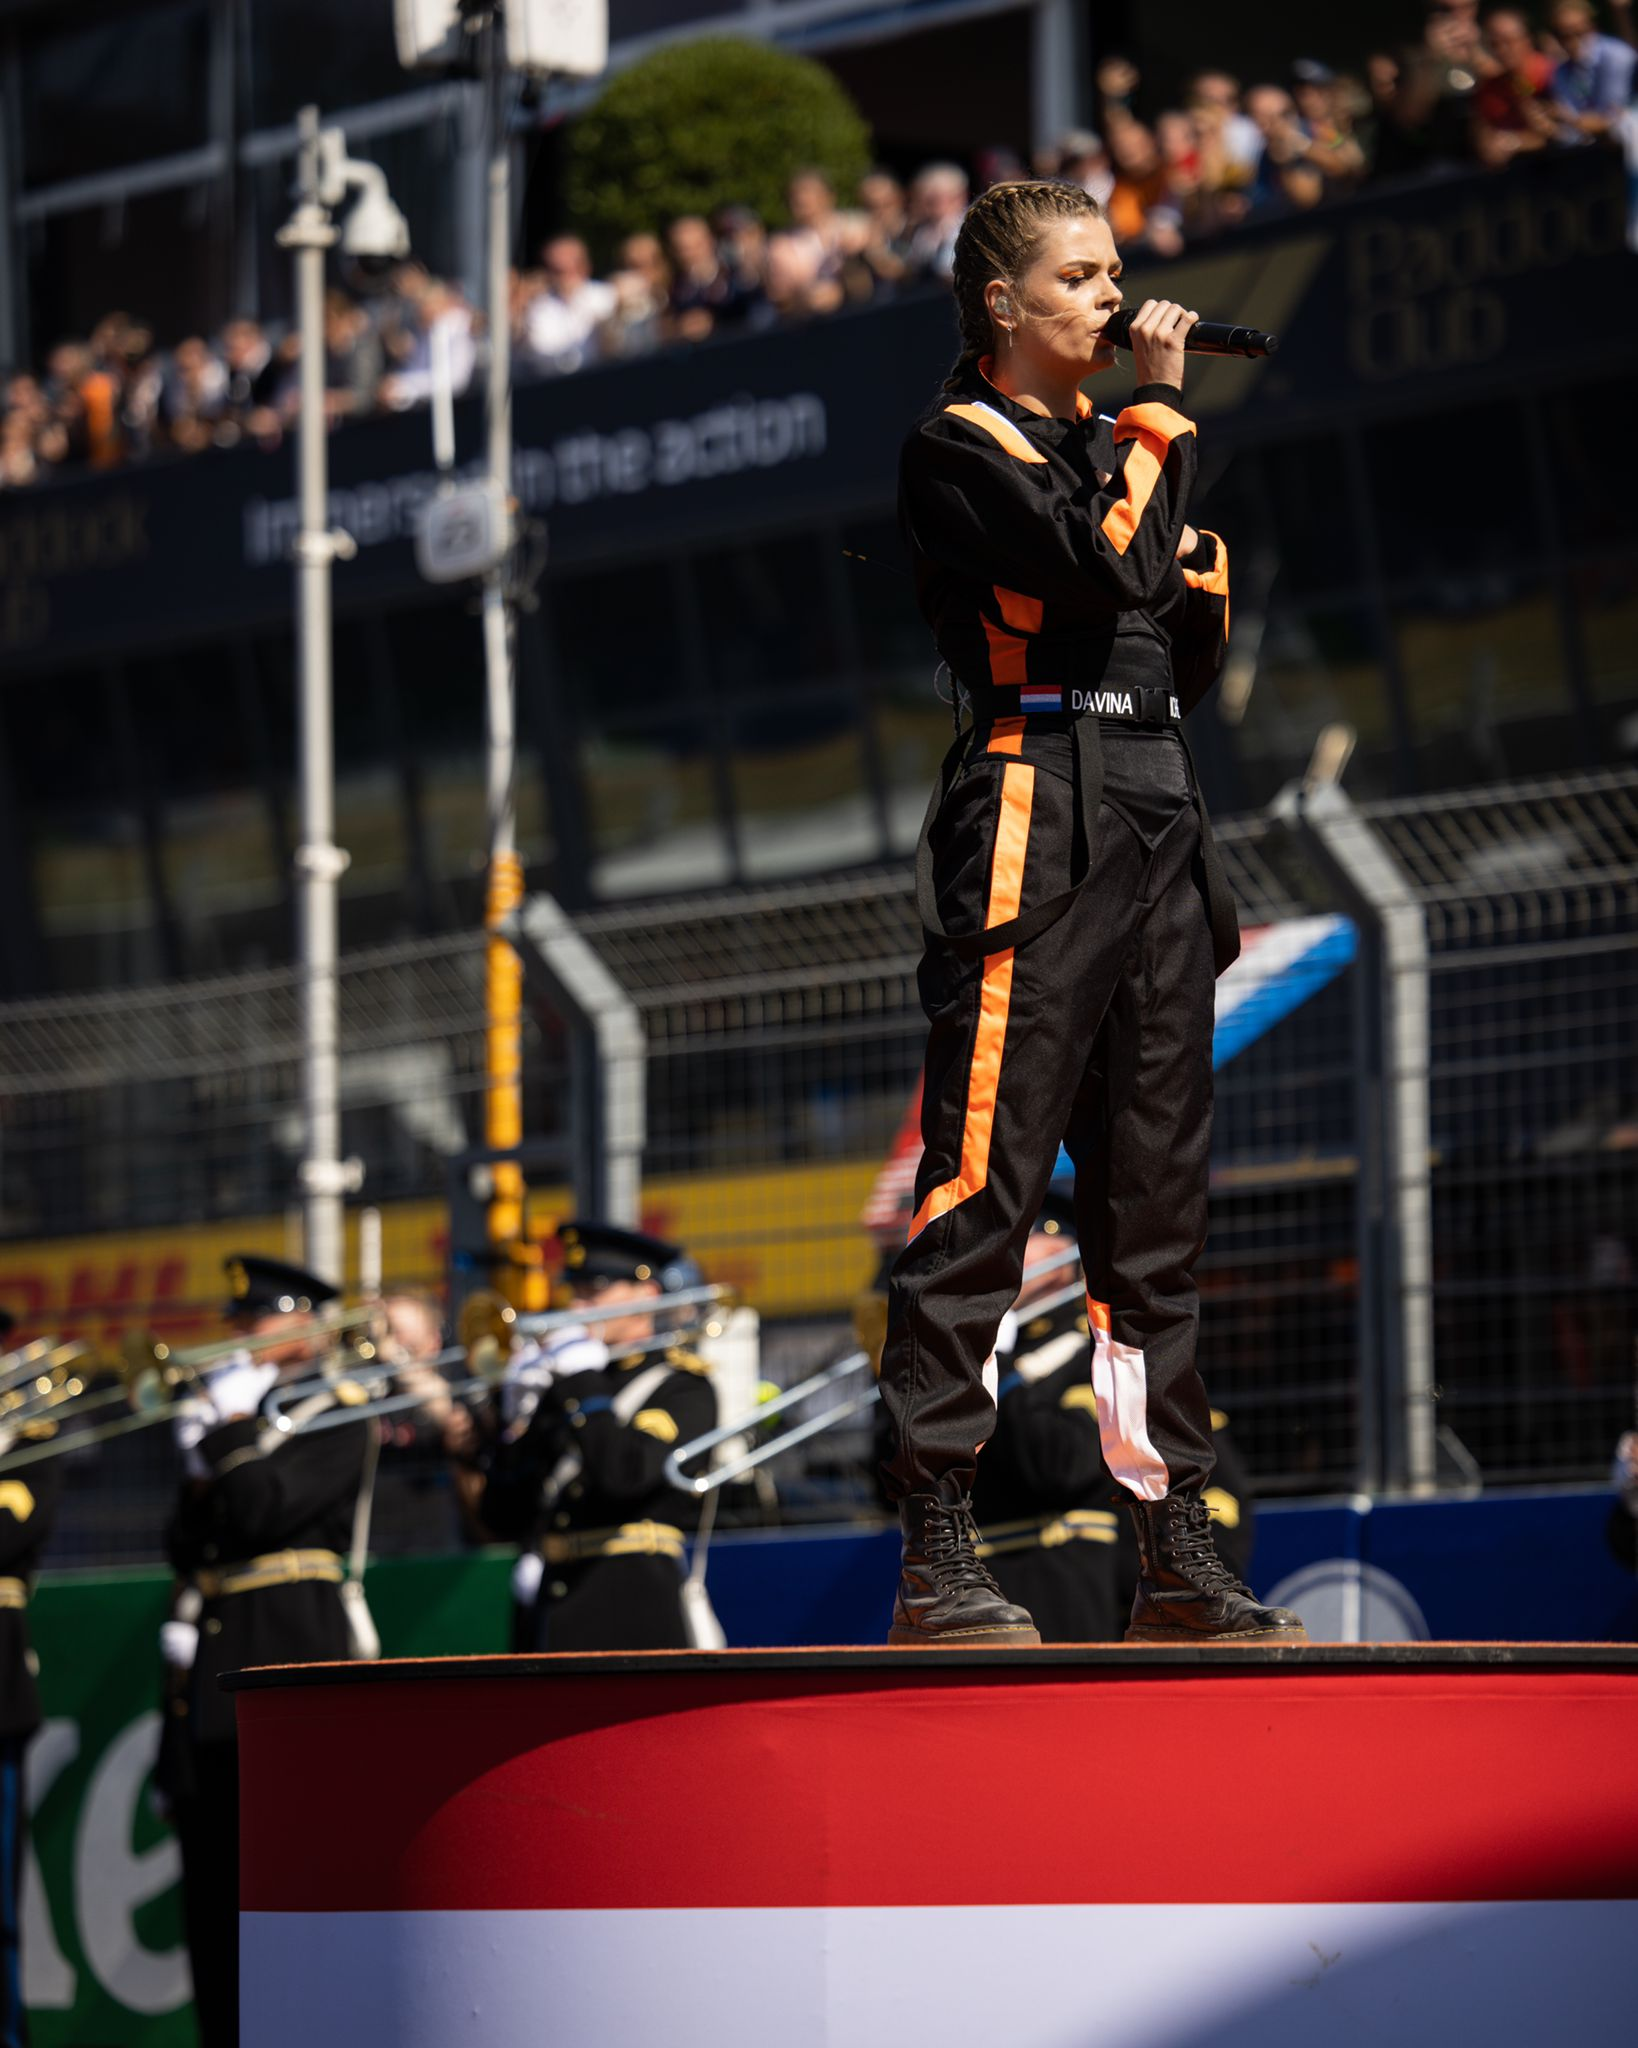 Davina Michelle on the podium (DGP Media)